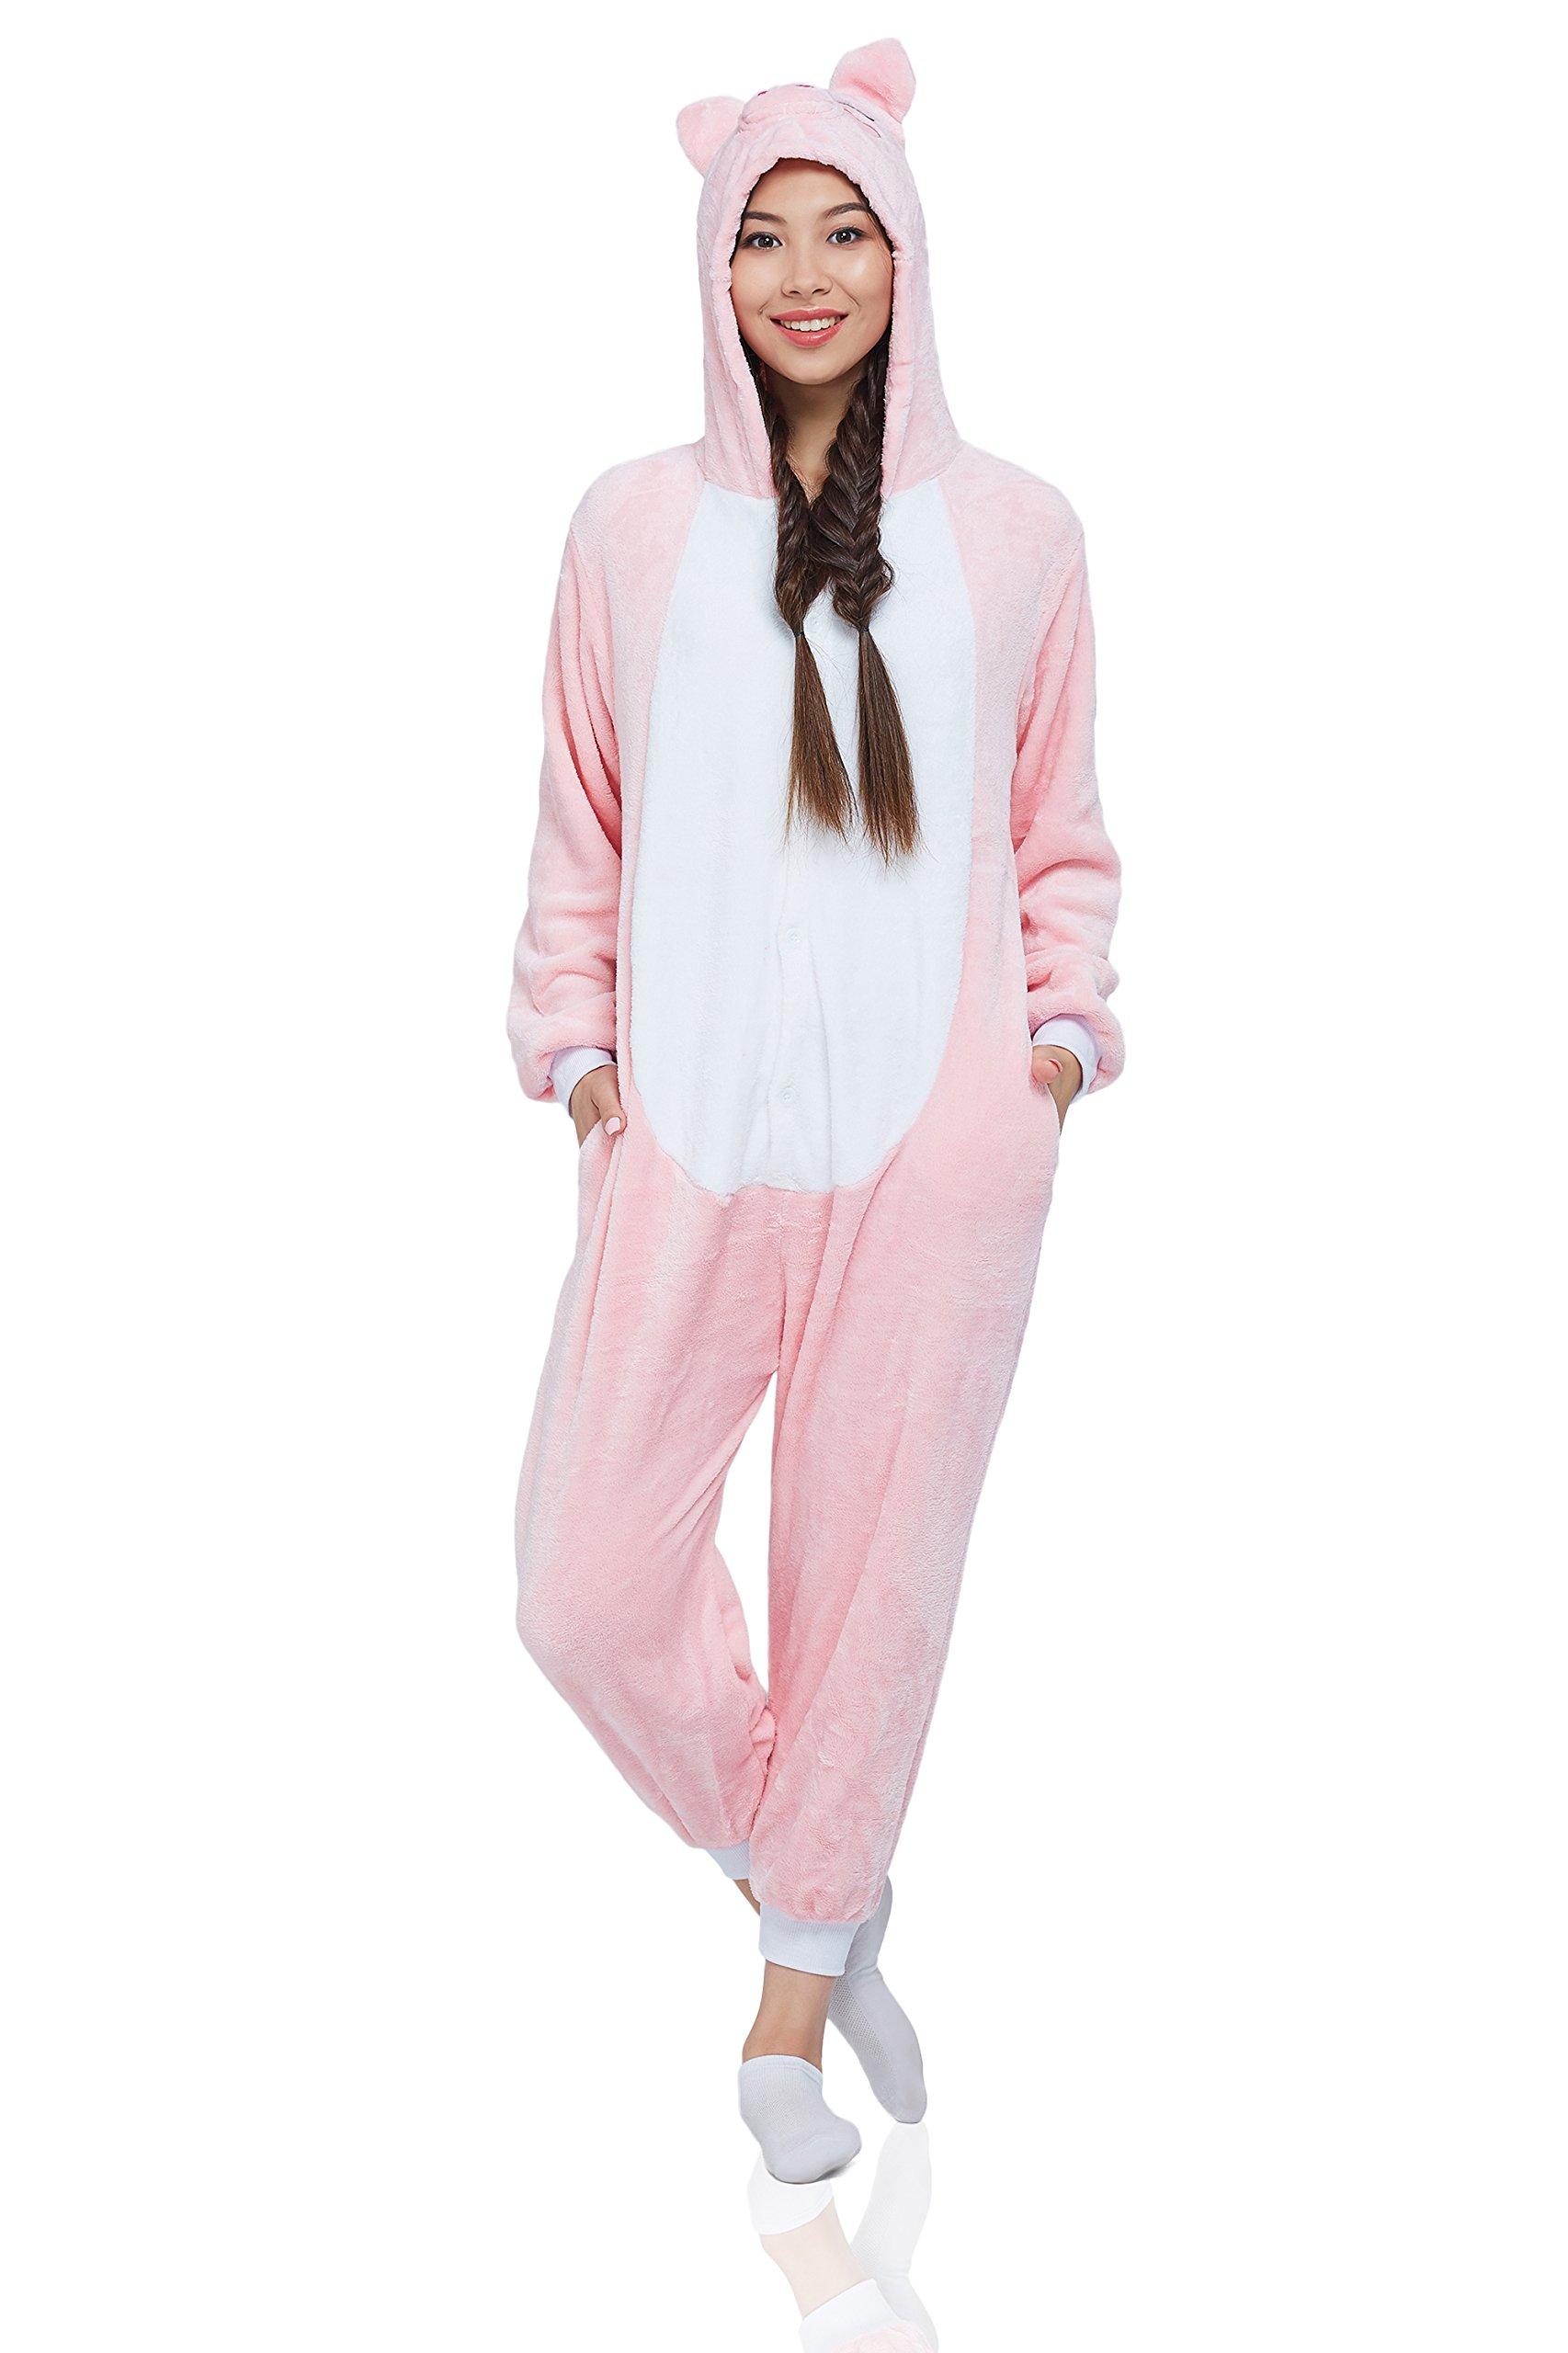 Nothing But Love Adult Piglet Kigurumi Animal Onesie Pajamas Plush Onsie One Piece Cosplay Costume (Small, Pink, White)